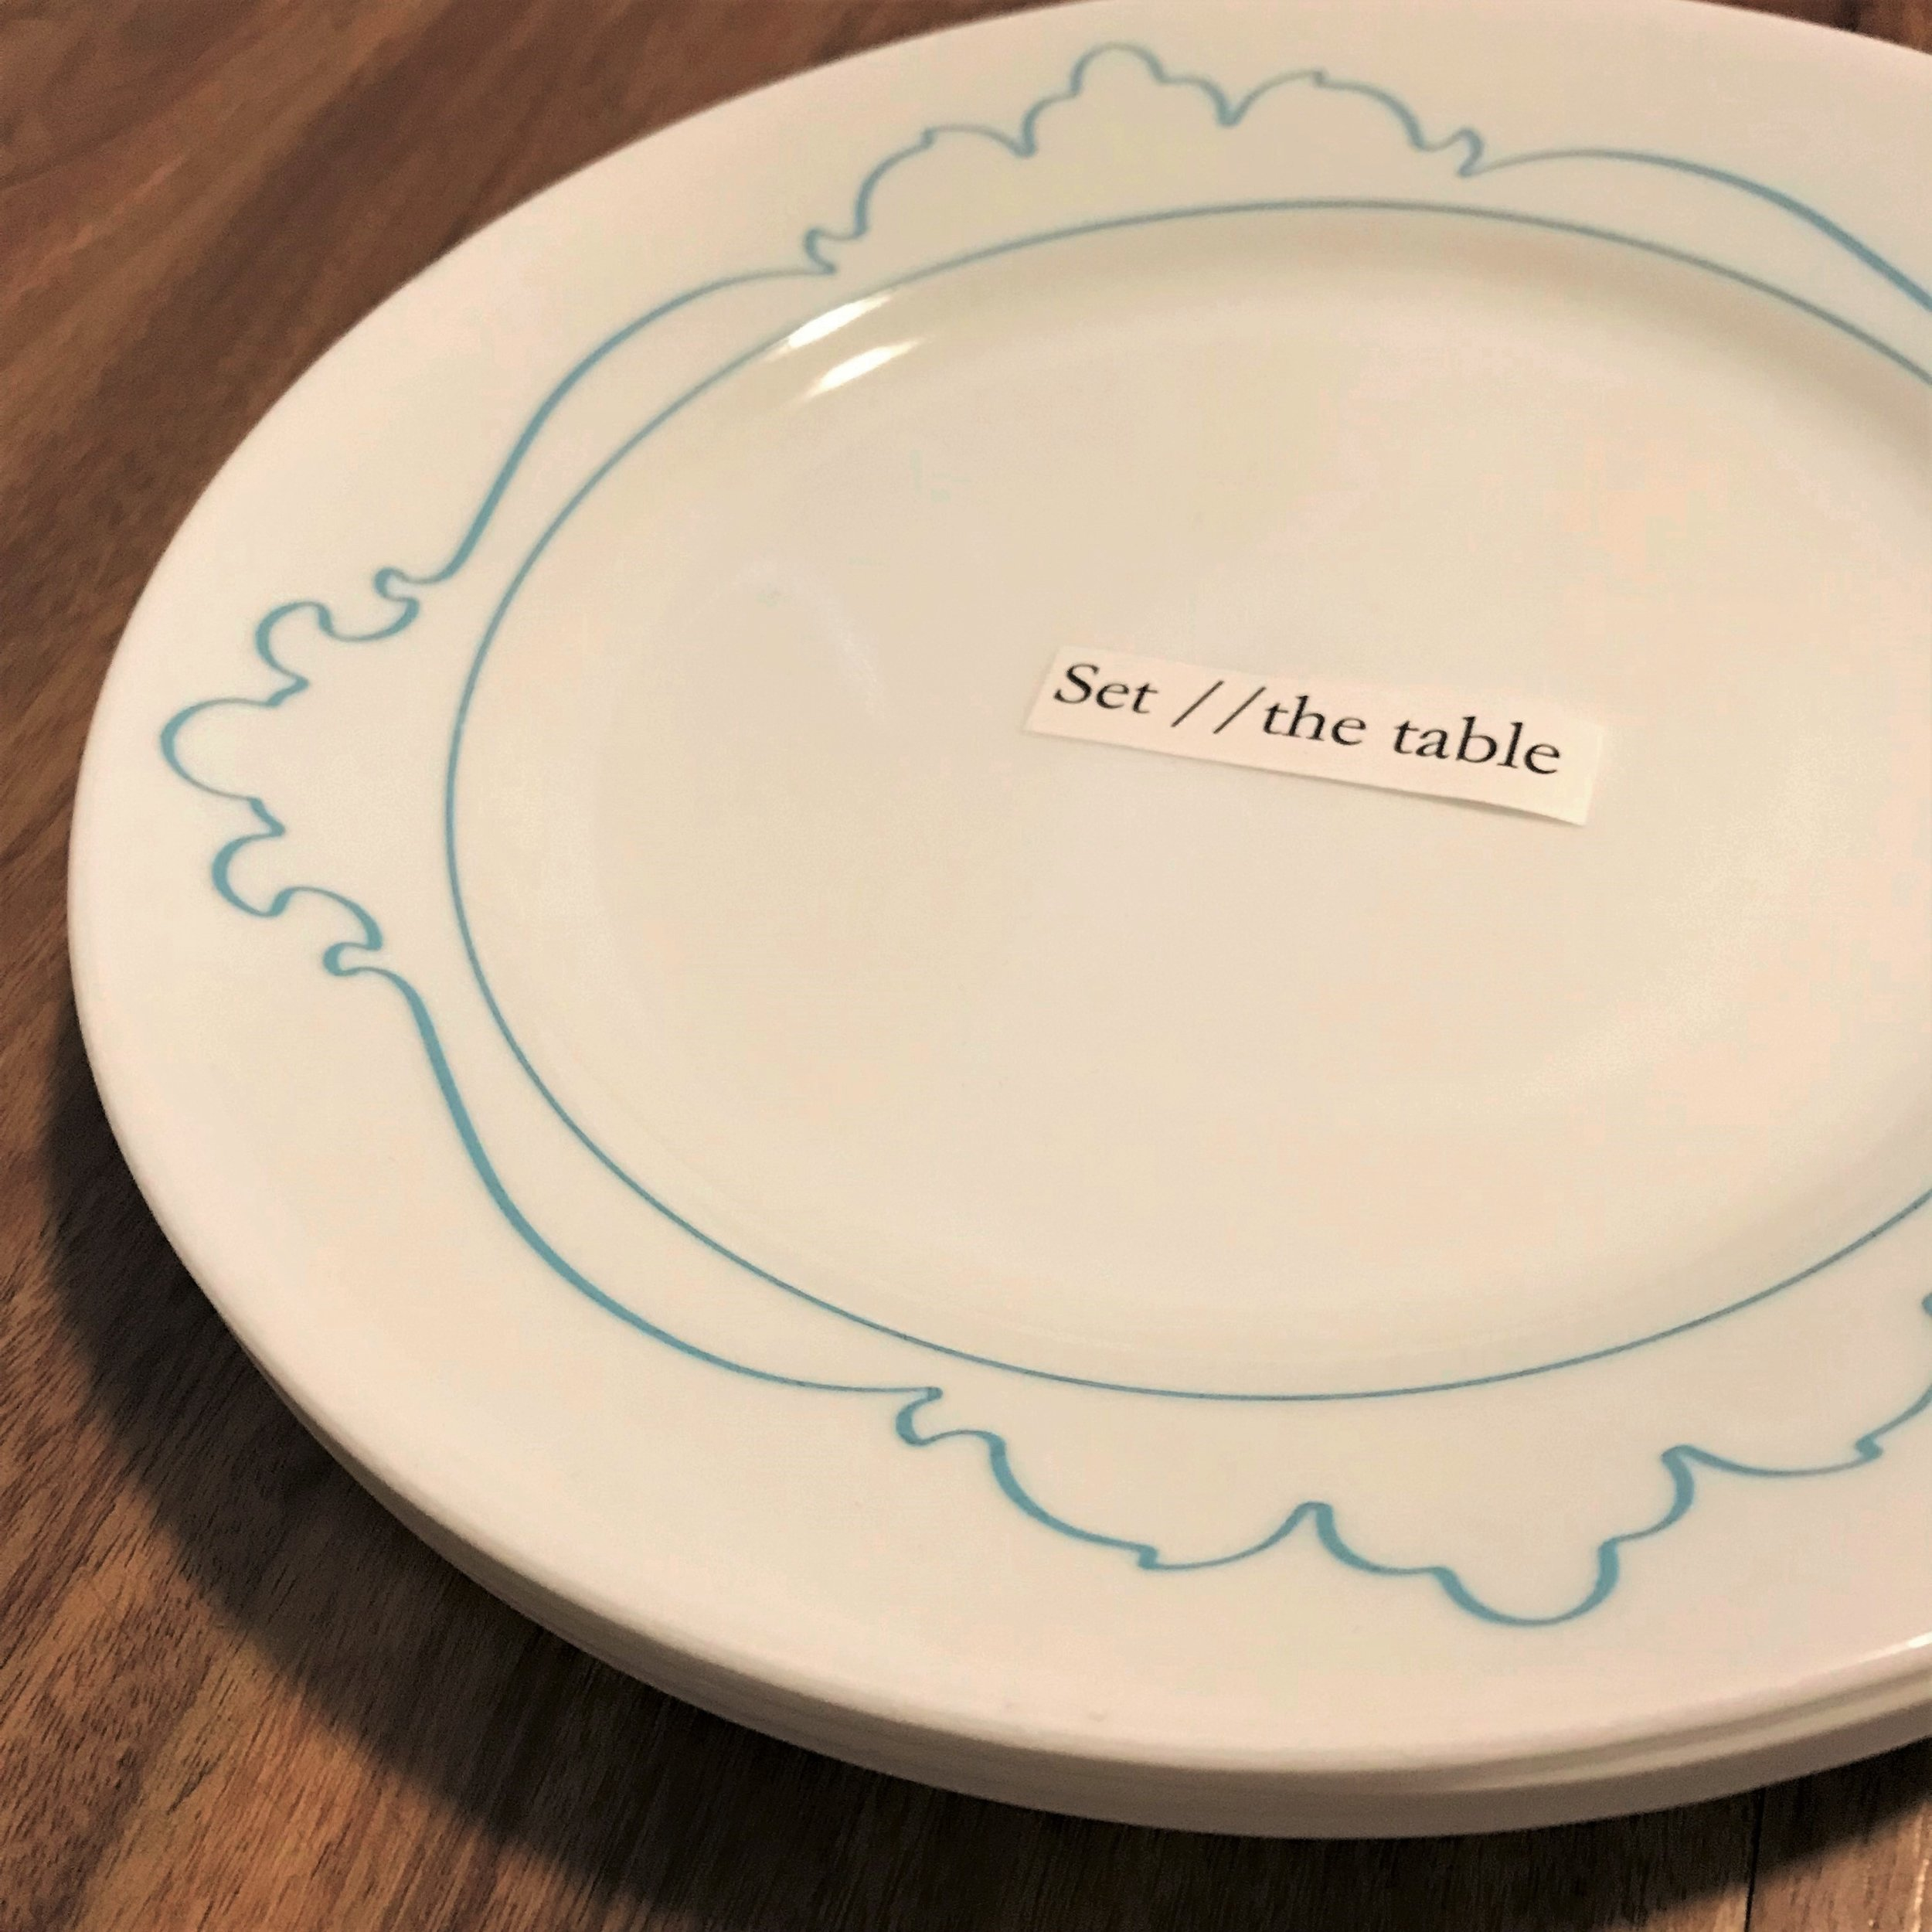 Set //the table title plate, Jennifer Lobaugh, 2018